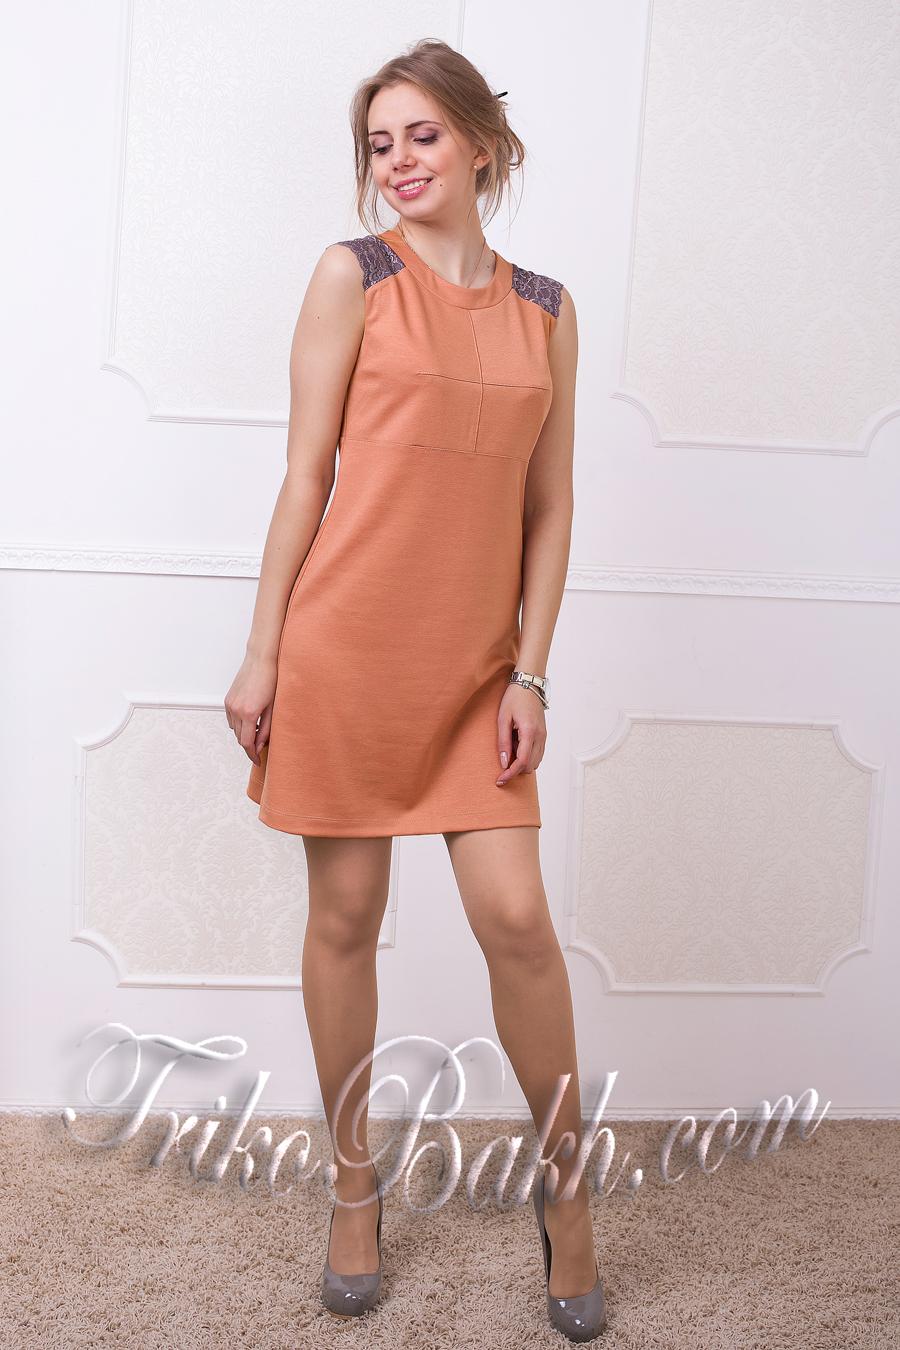 258c5599483 Купить платье от украинского производителя   Купити плаття від українського  виробника